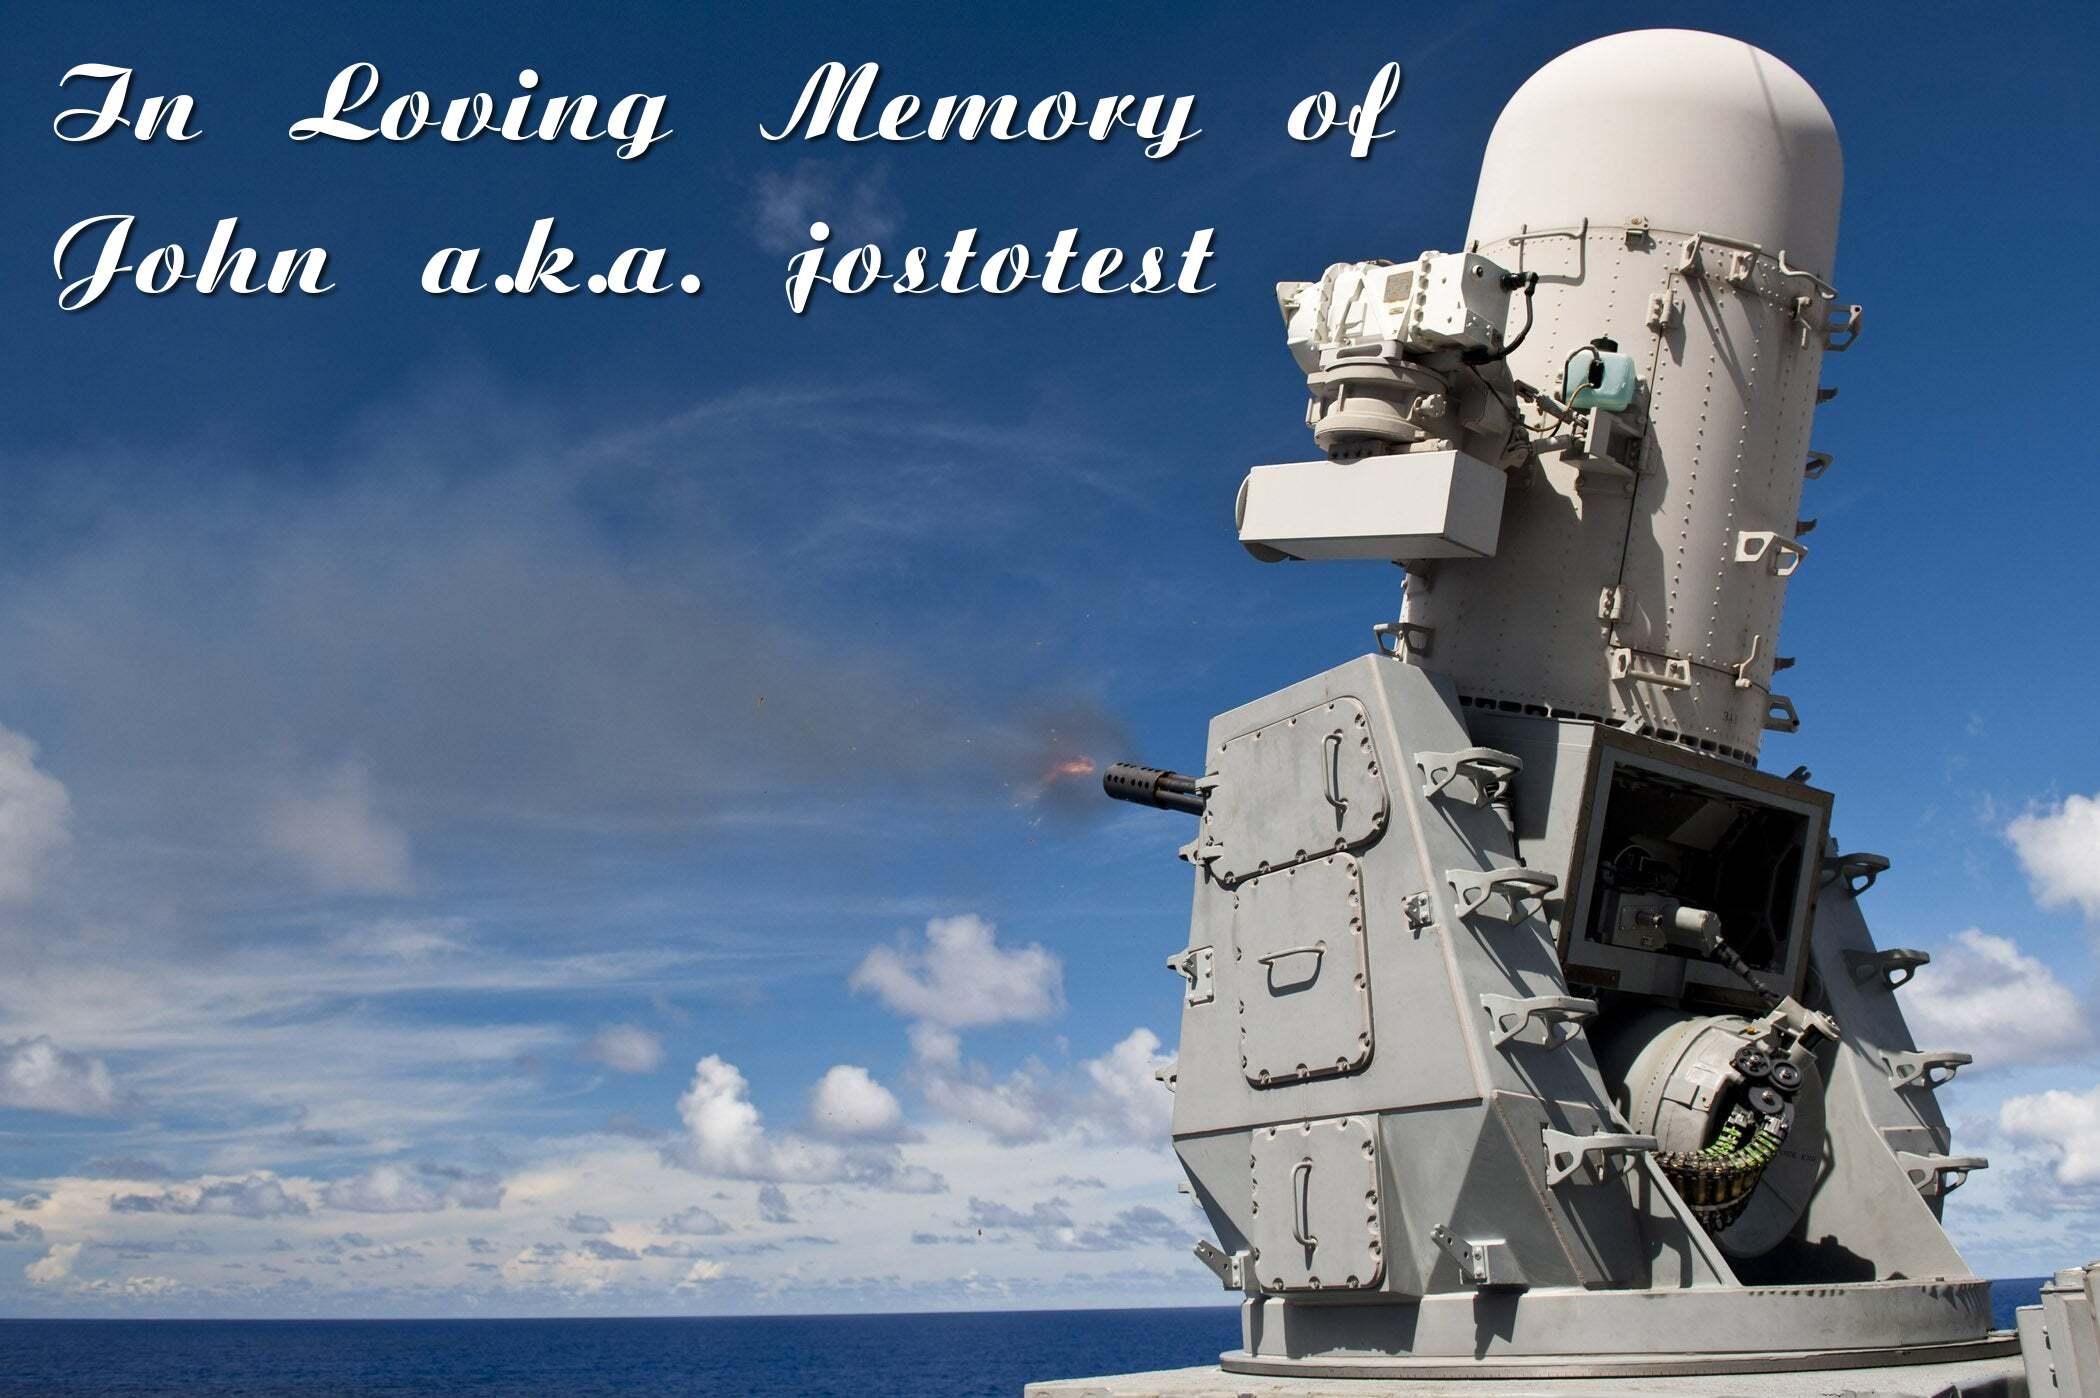 https://cdn.discordapp.com/attachments/600457043605717005/743857602223669389/In_Loving_Memory_of_John_by_S_h_a_r_k_93.jpg